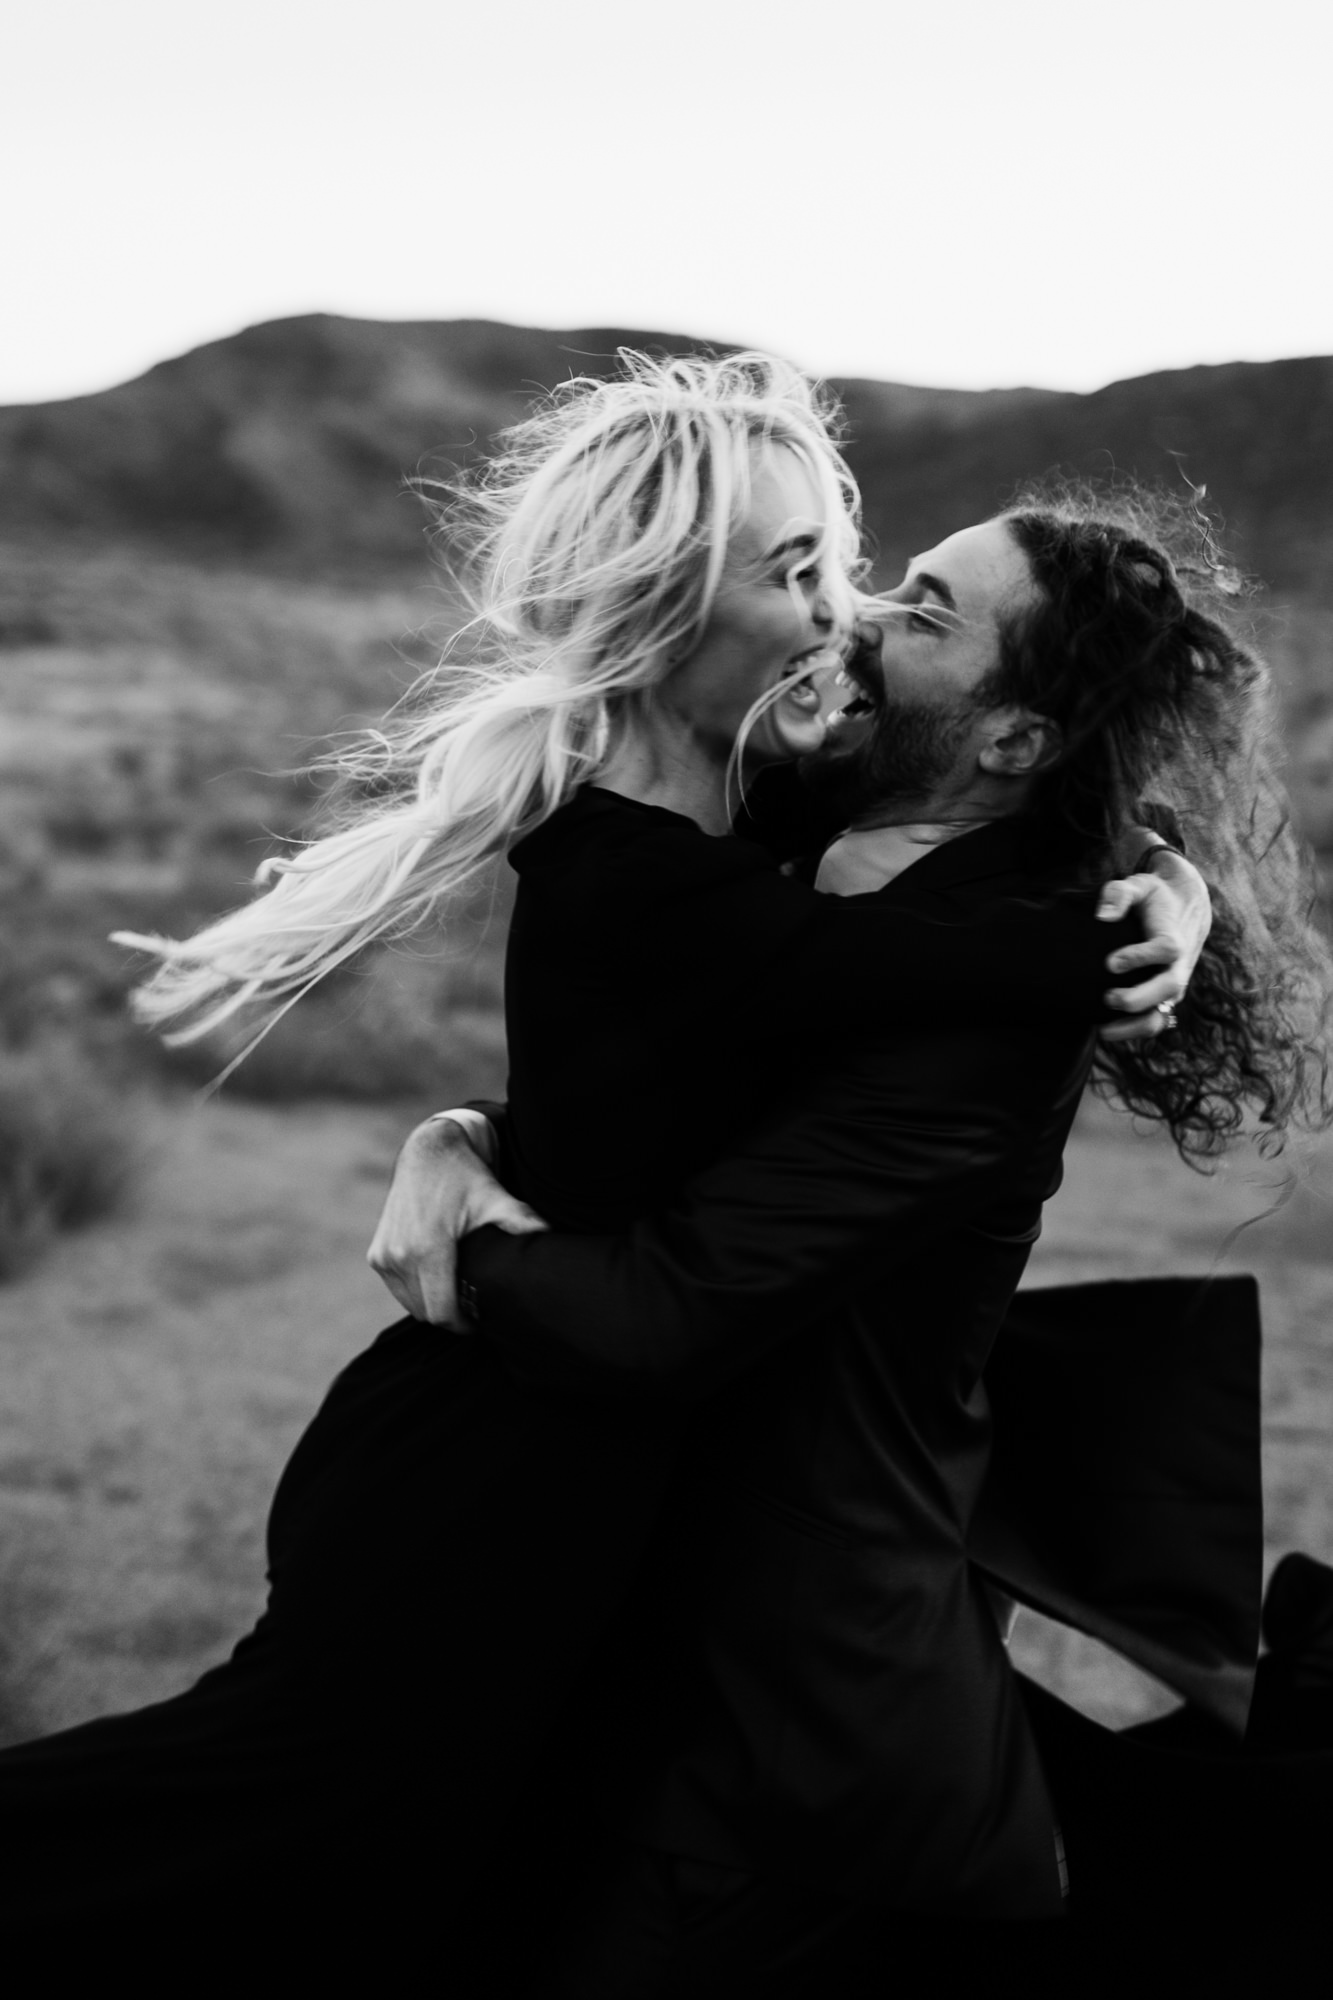 adventurous elopement in moab, utah | destination adventure wedding photographers | the hearnes adventure photography | www.thehearnes.com